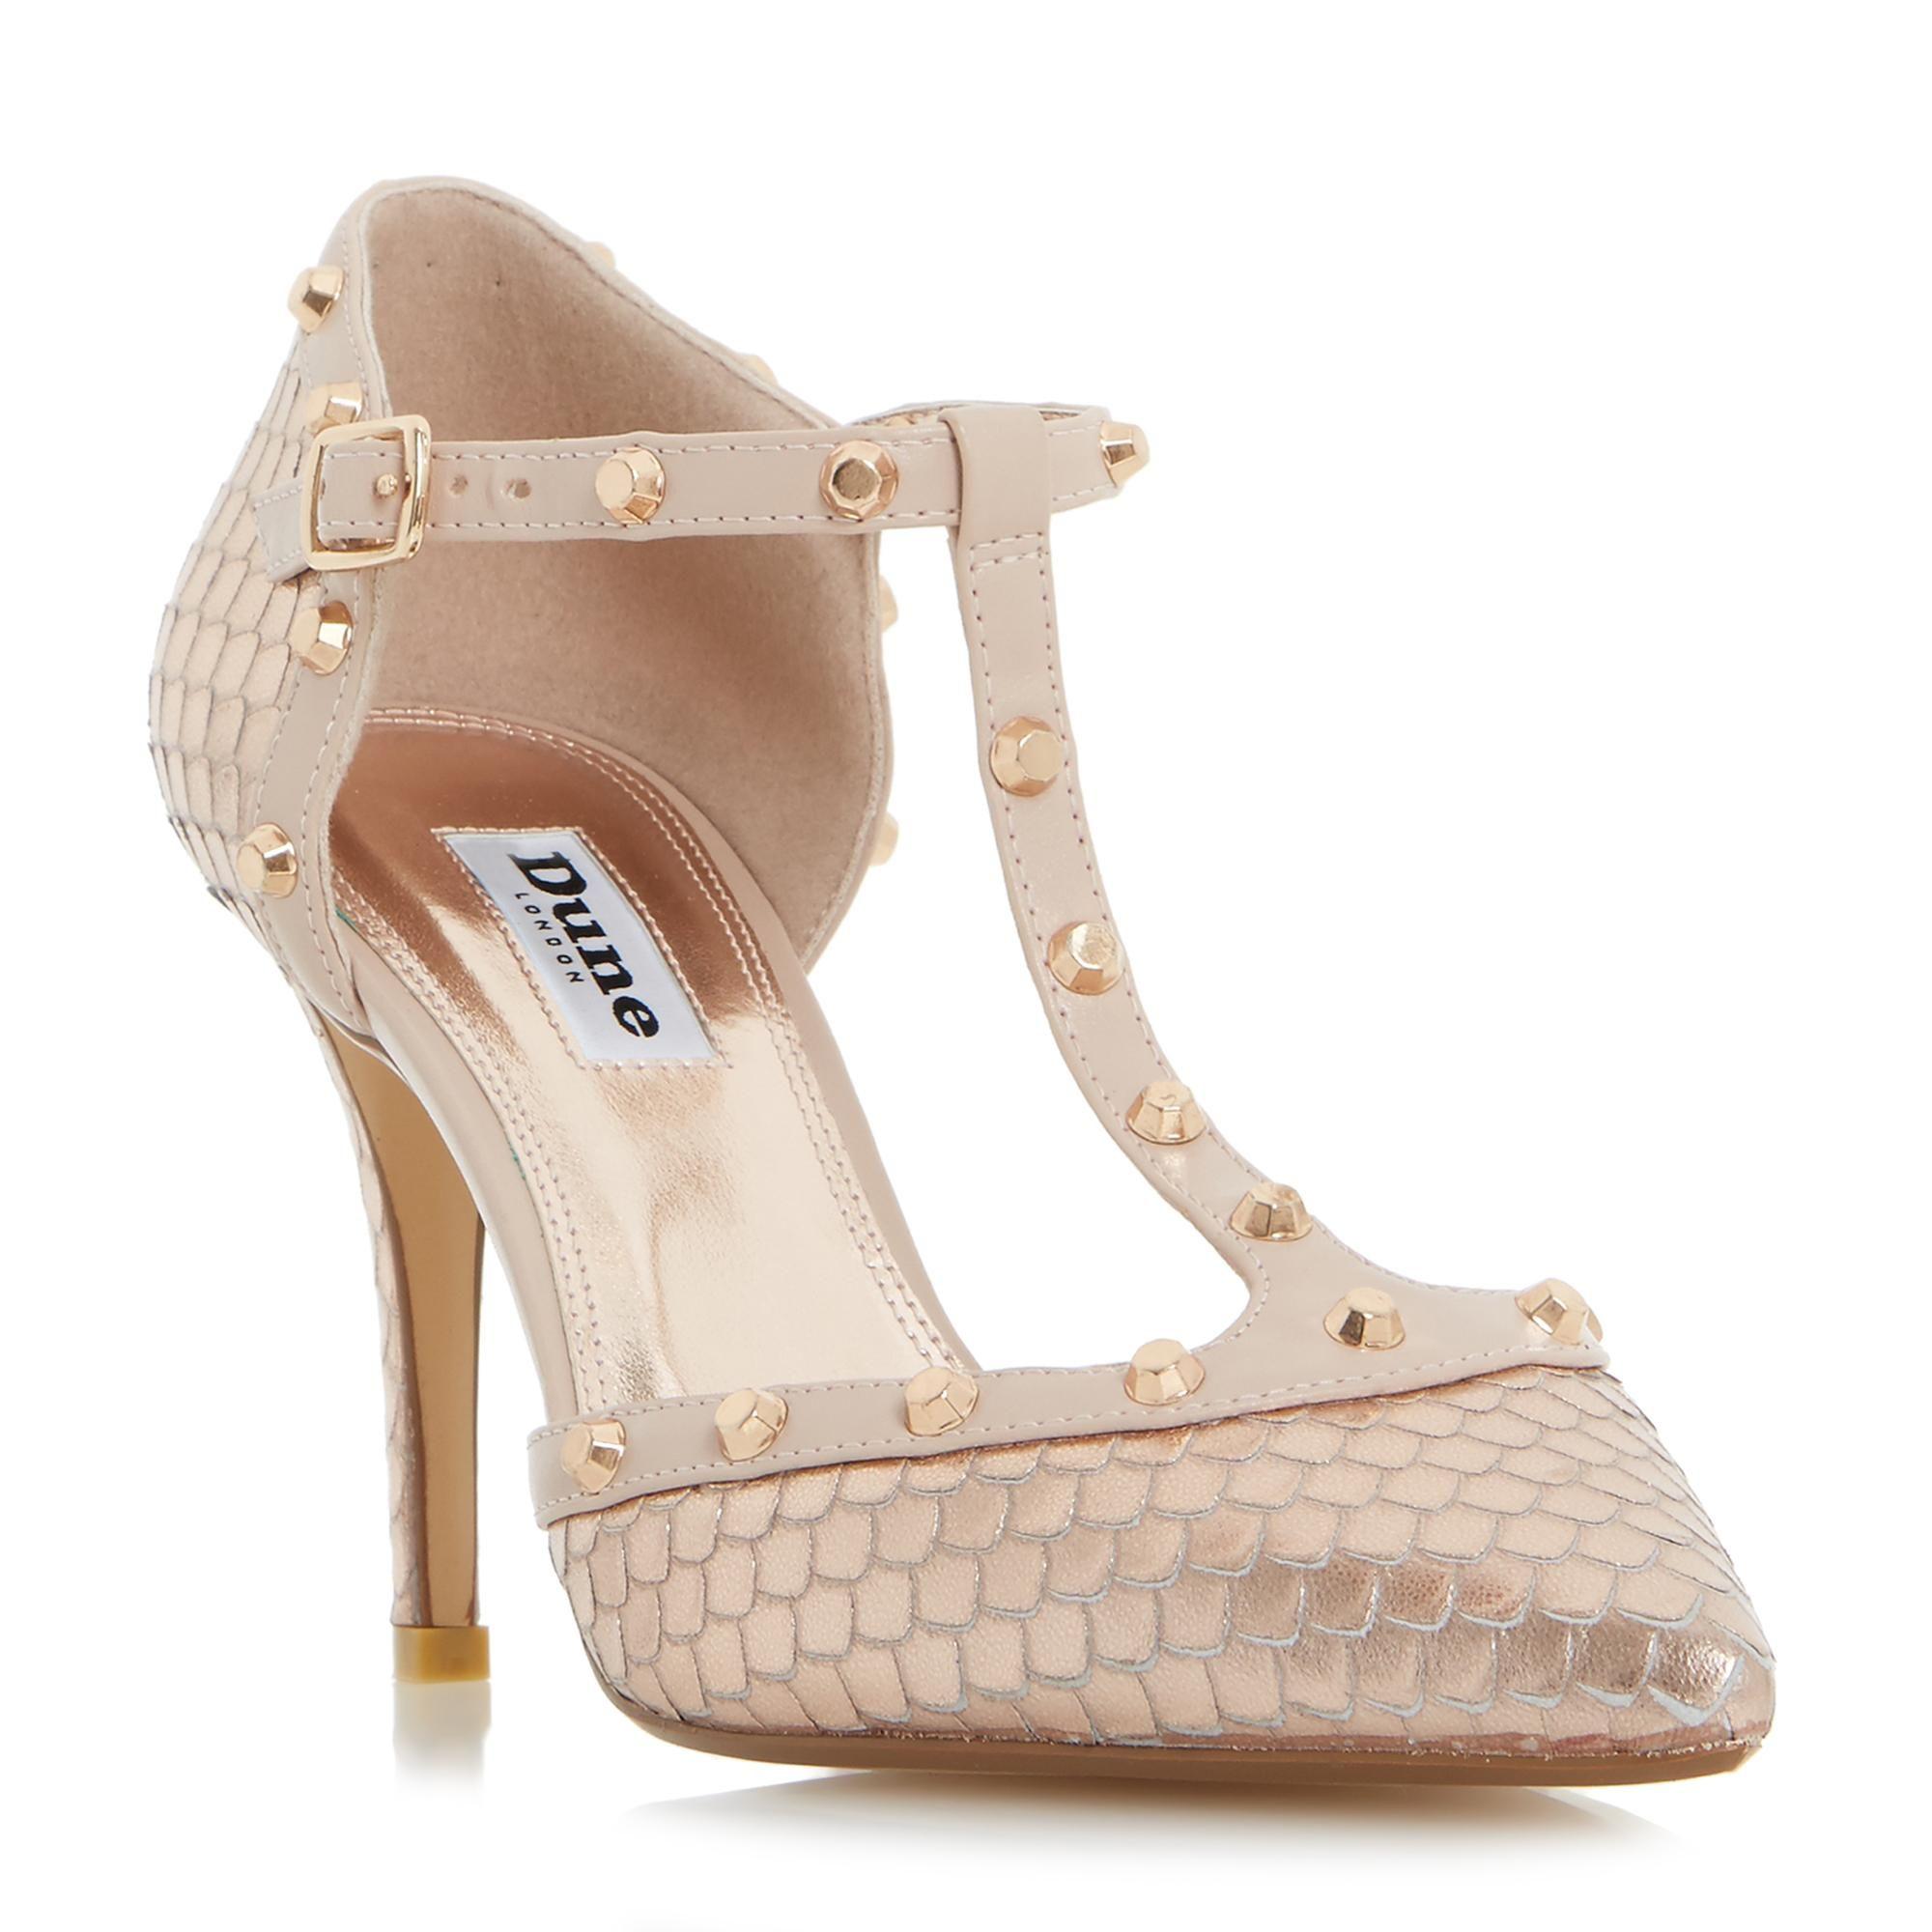 870e681d11af1 DUNE LADIES CLIOPATRA - Studded T-bar Court Shoe - rose gold